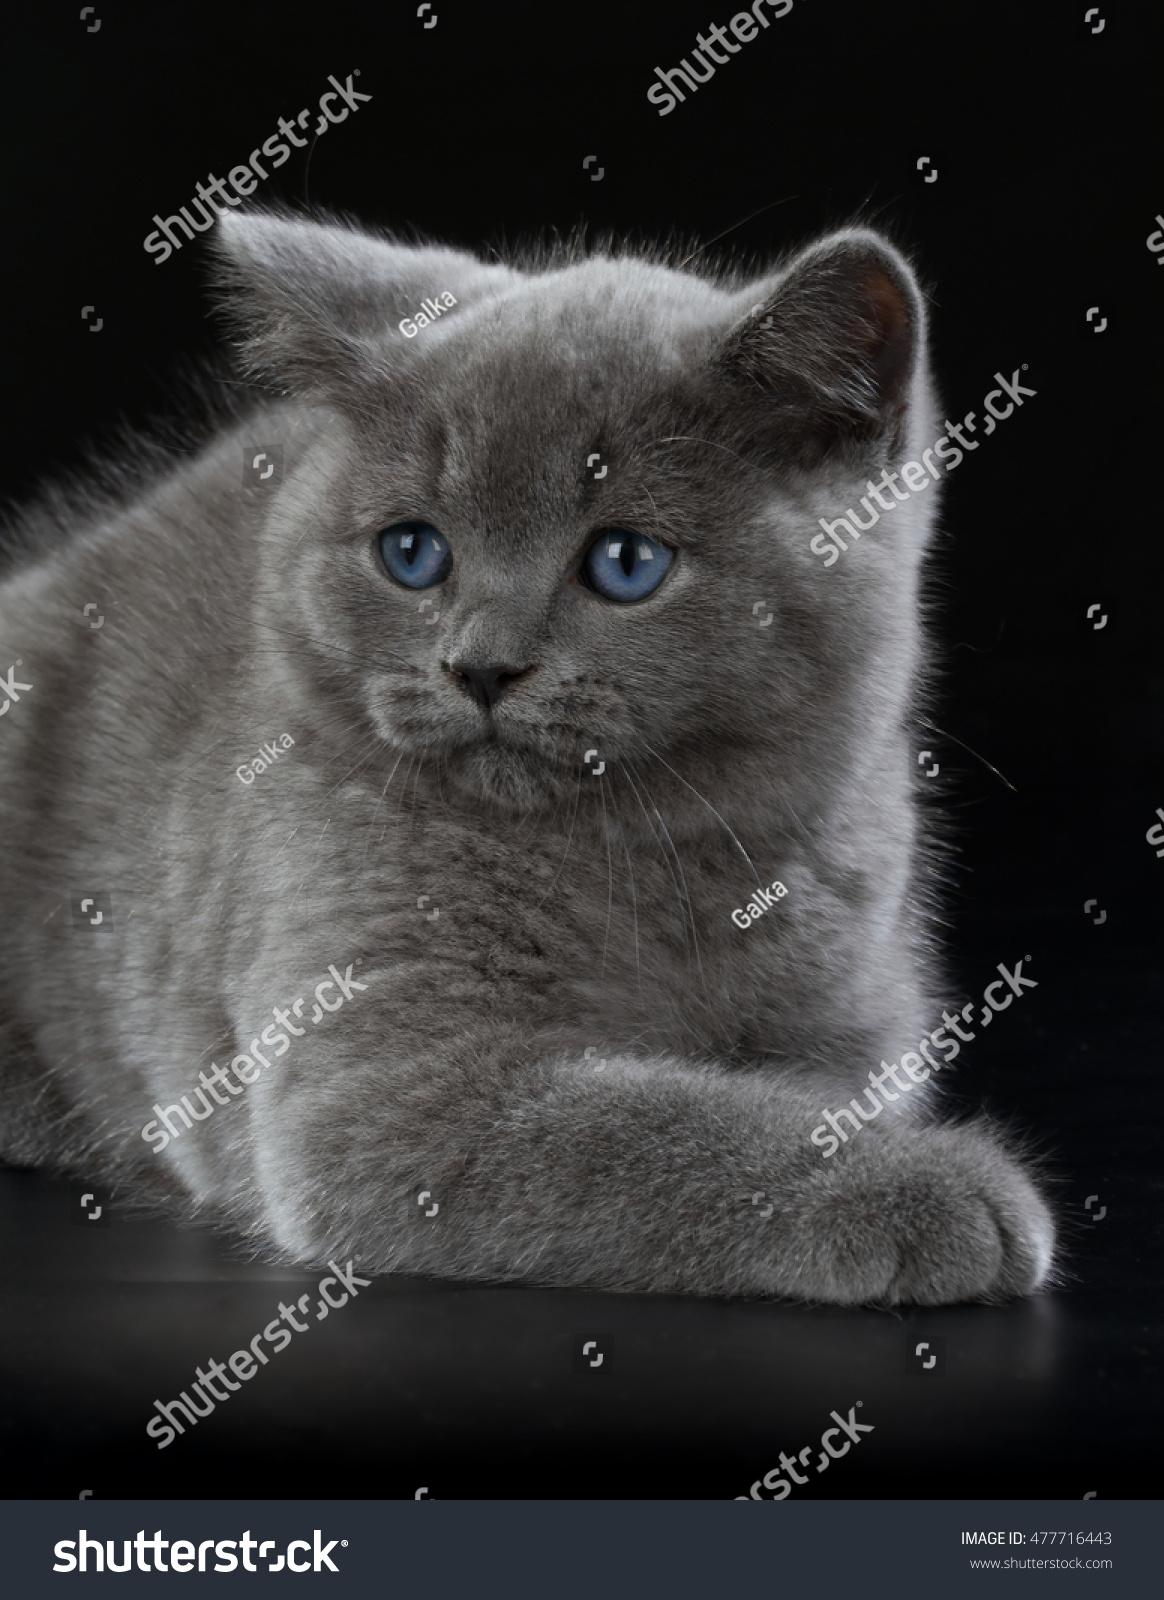 Purebred British Shorthair Blue Kitten Stock